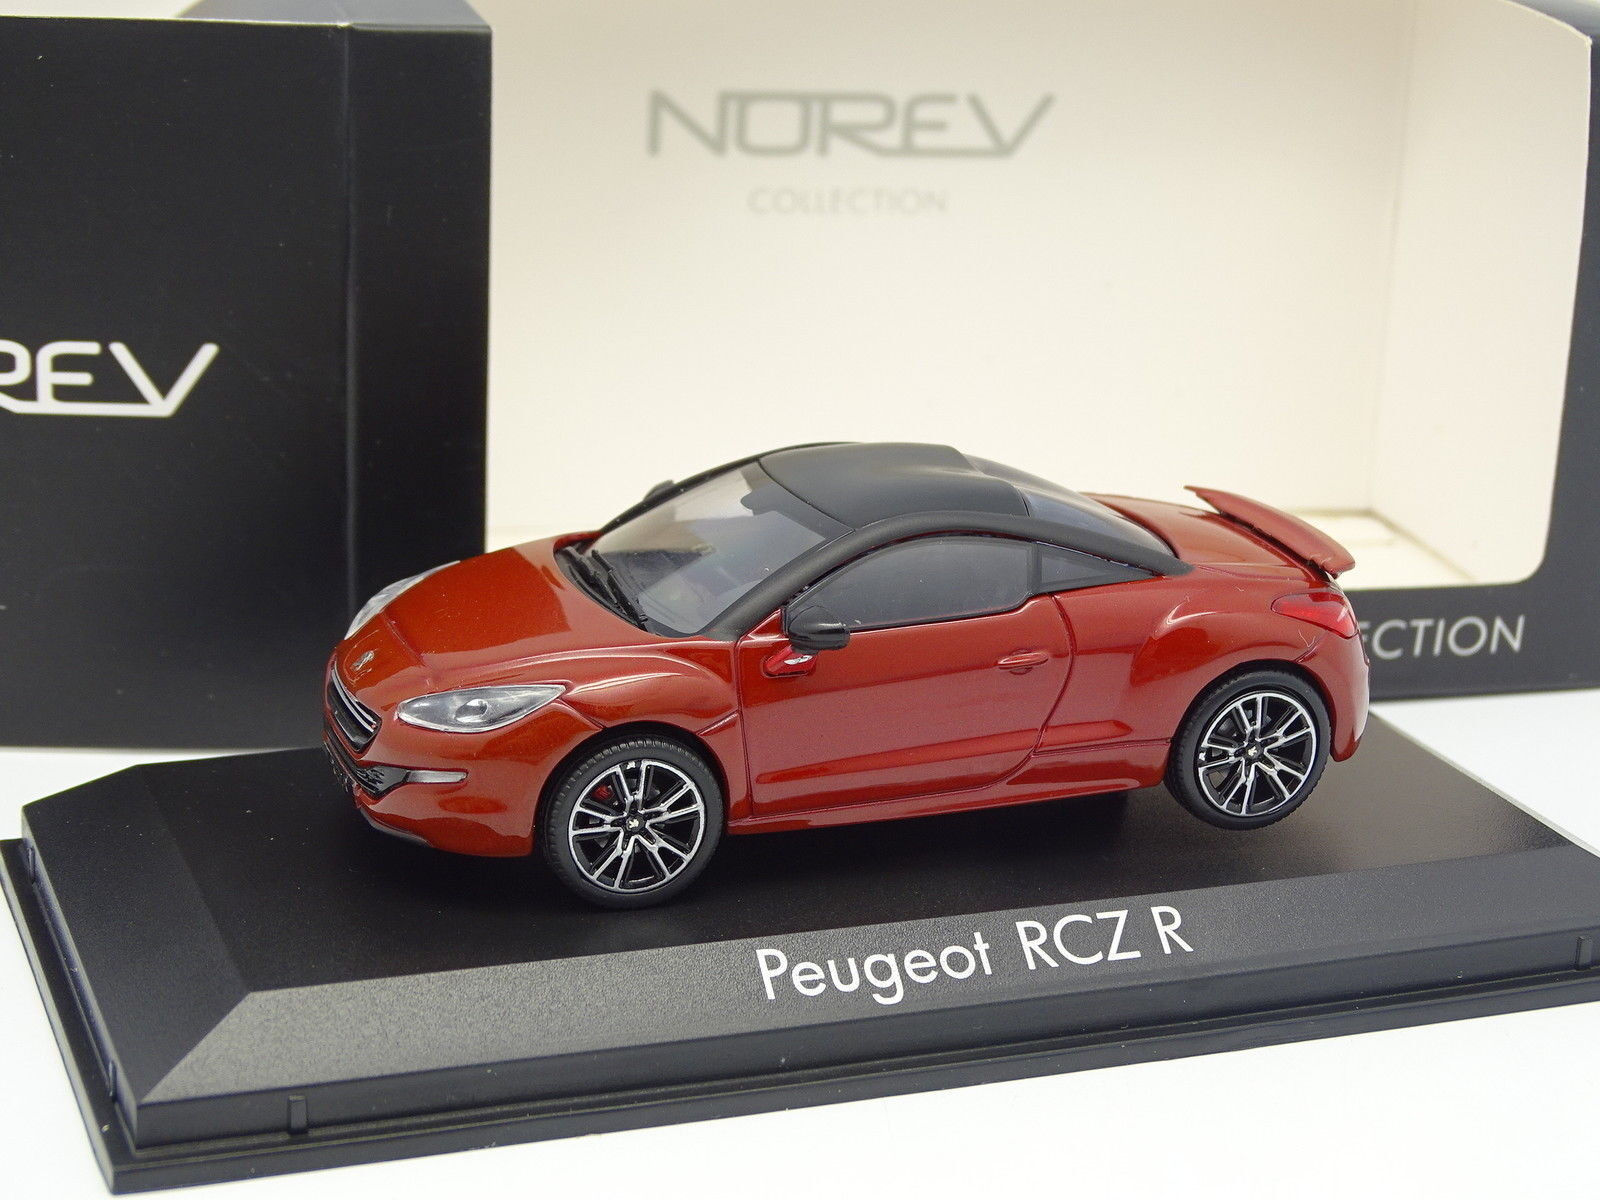 Norev 1 43 - Peugeot RCZ R red